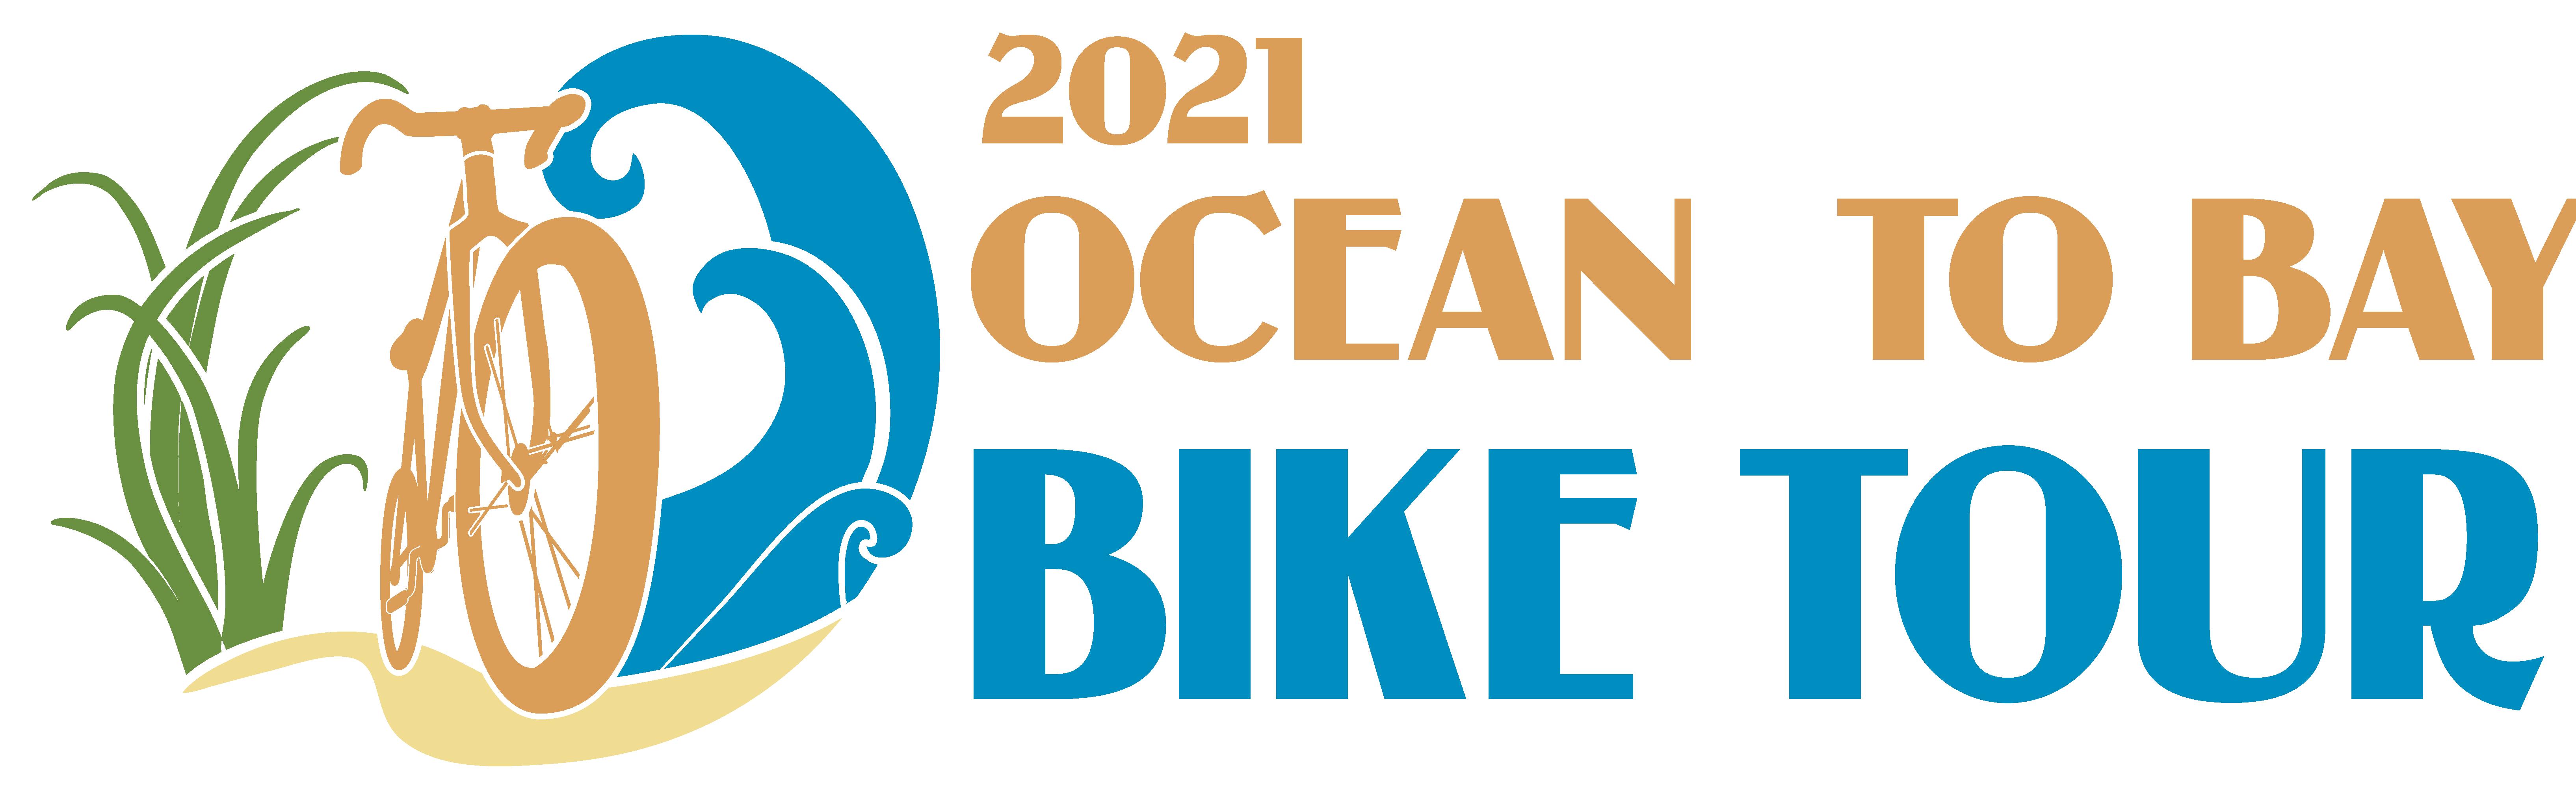 Ocean-to-Bay-Bike-Tour